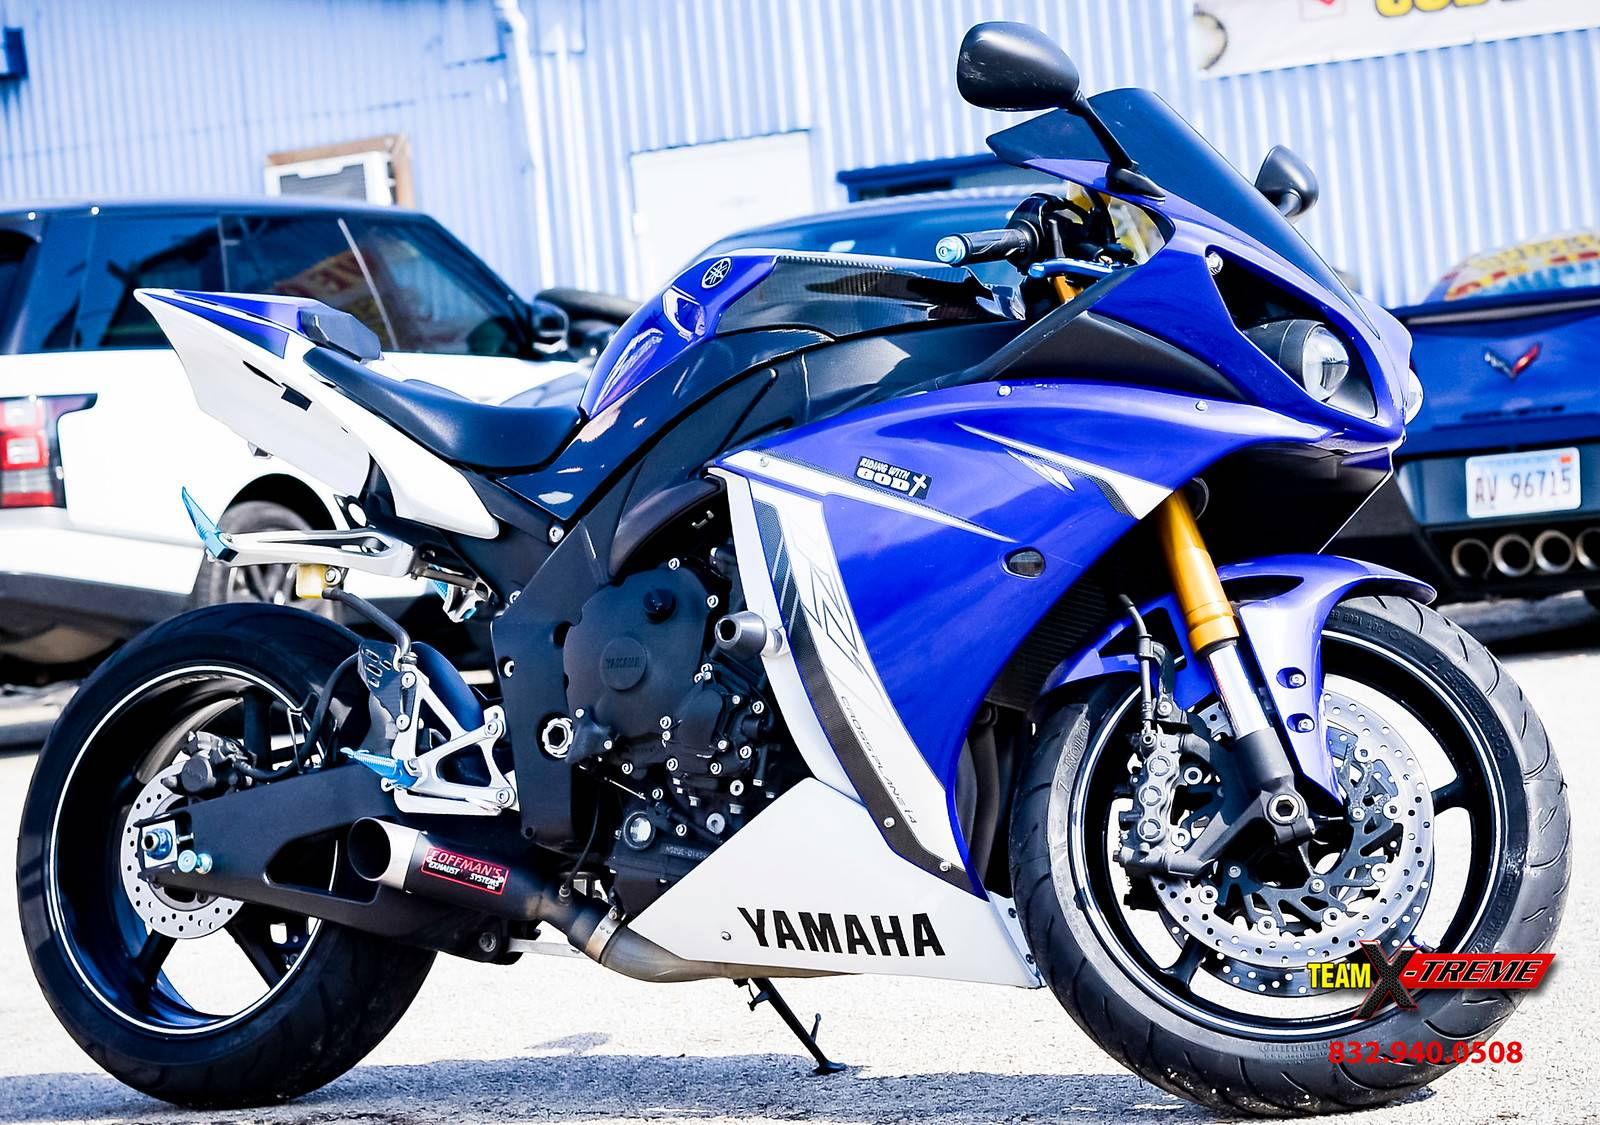 2011 Yamaha YZF-R1 for sale 216633